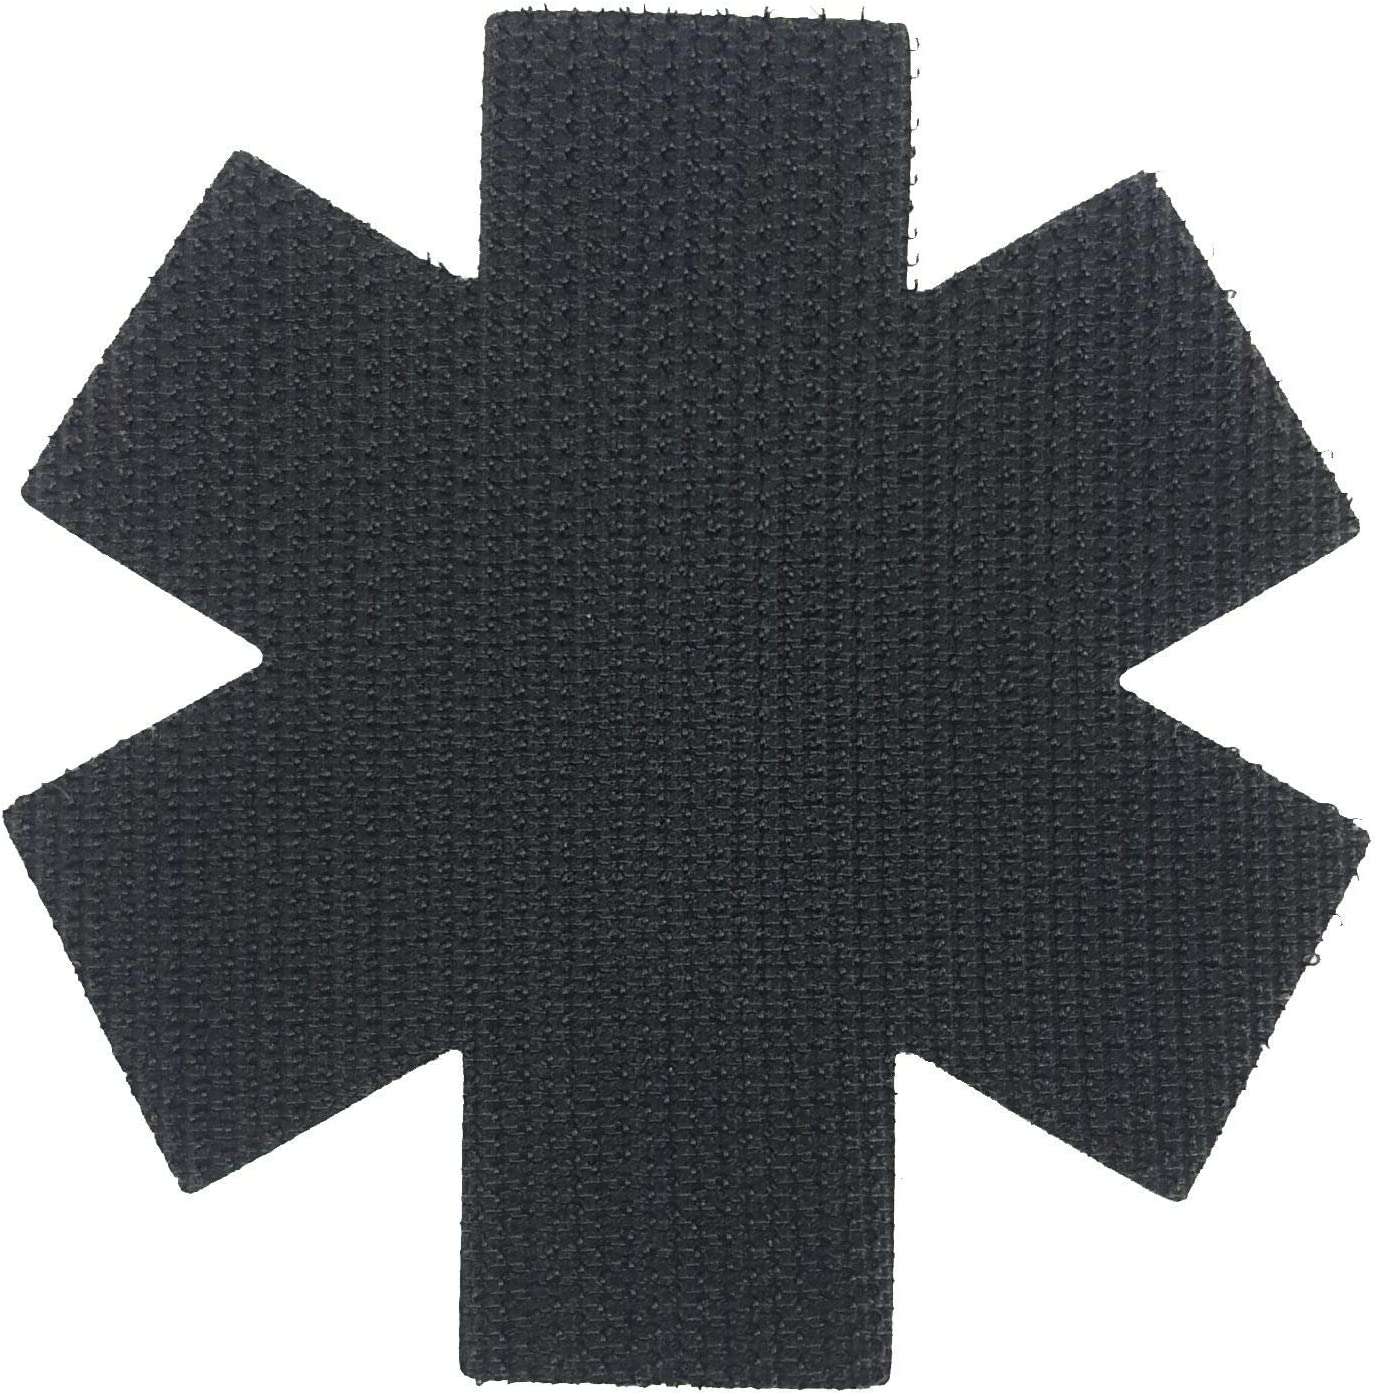 EMS Medical Responder 3 Star of Life Dual Snake Black /& Grey PVC Morale Patch